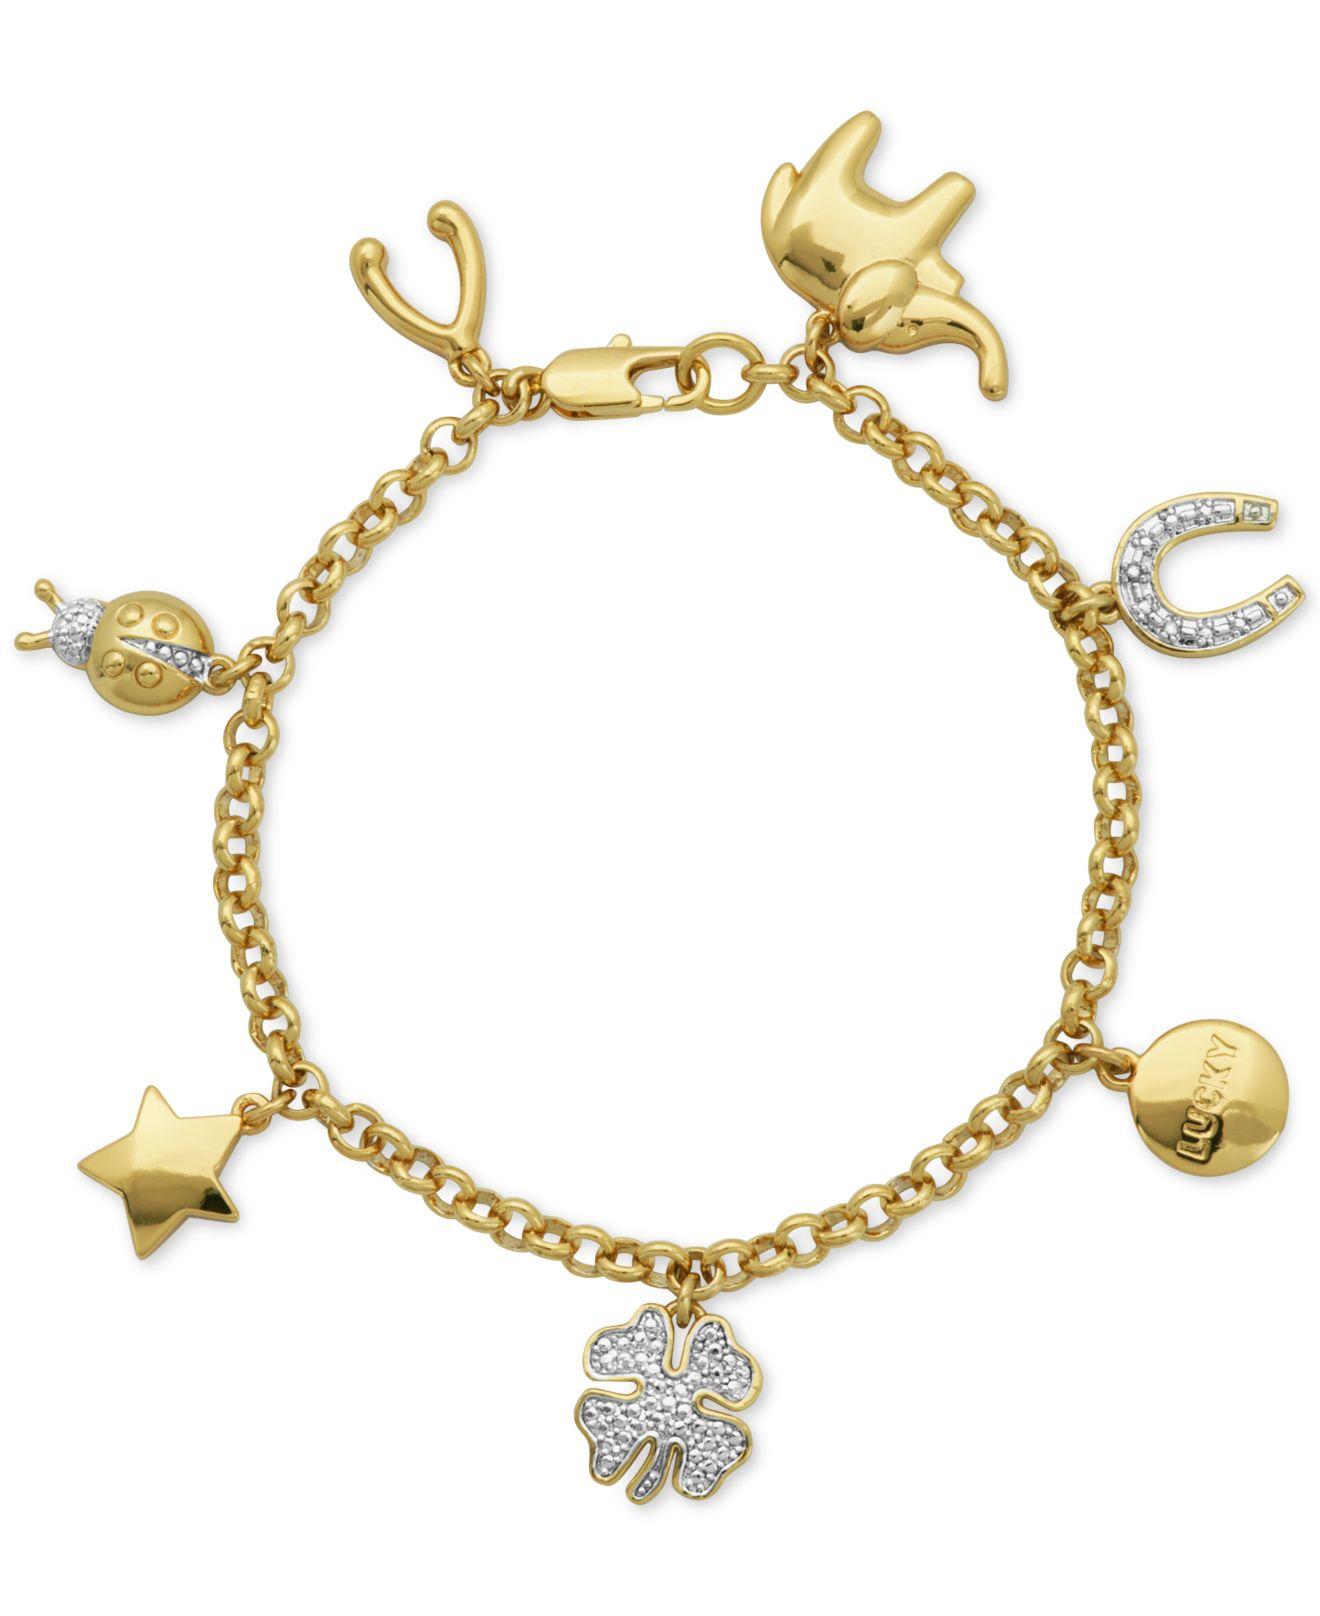 Macy s Diamond Accent Inspirational Charm Bracelet In 18k Gold